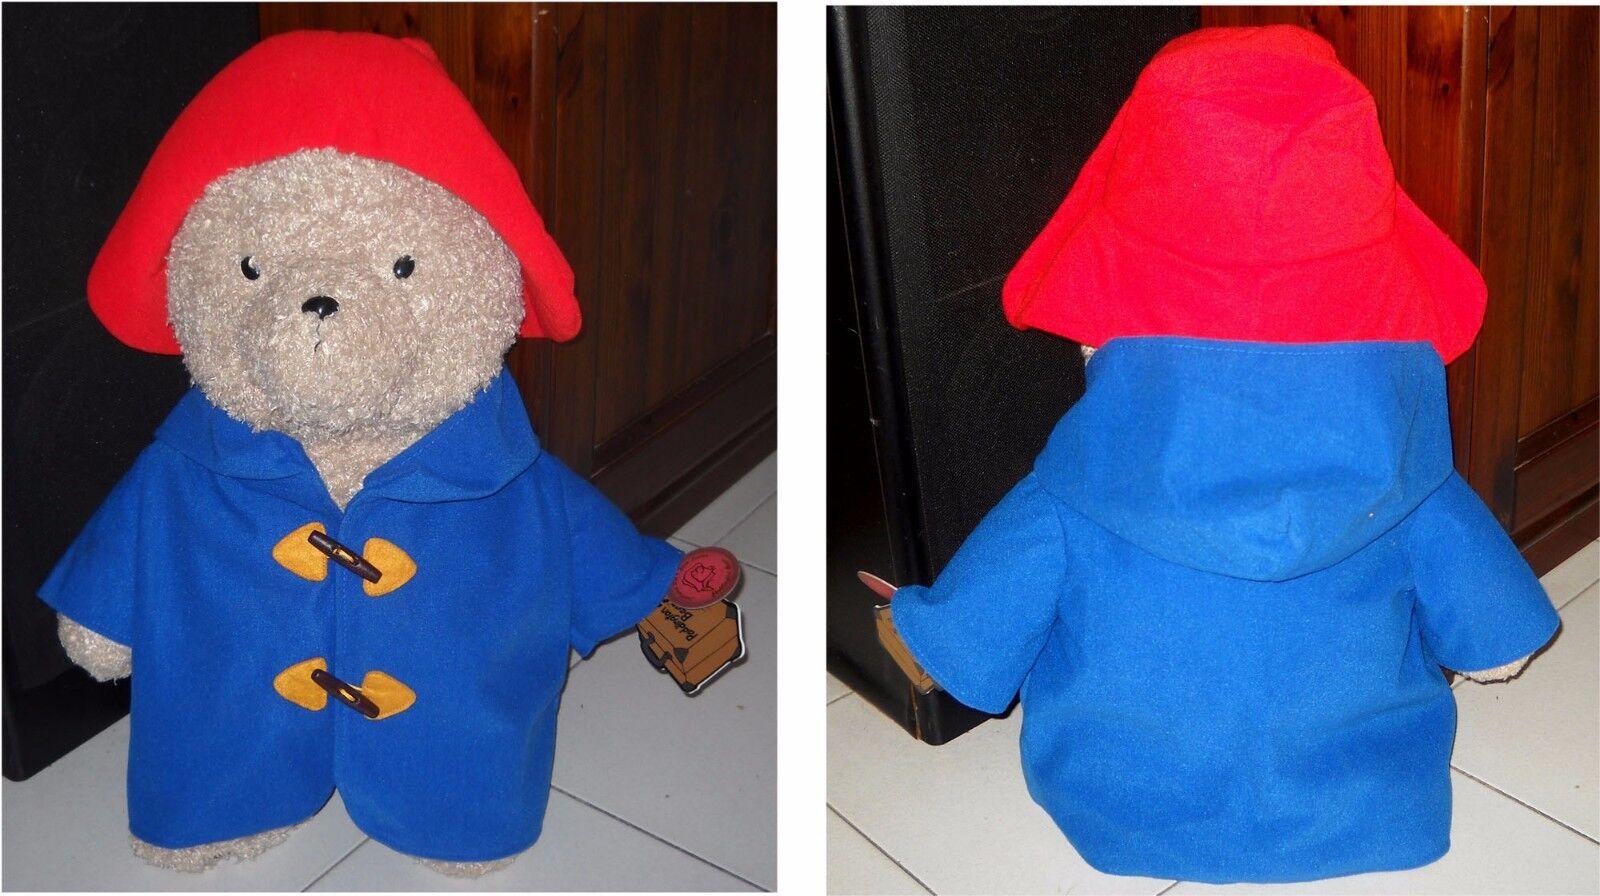 Plüsch Bär Paddington bear handgefertigte gegründet 1958 London 60 Cm Cm Cm bc515b